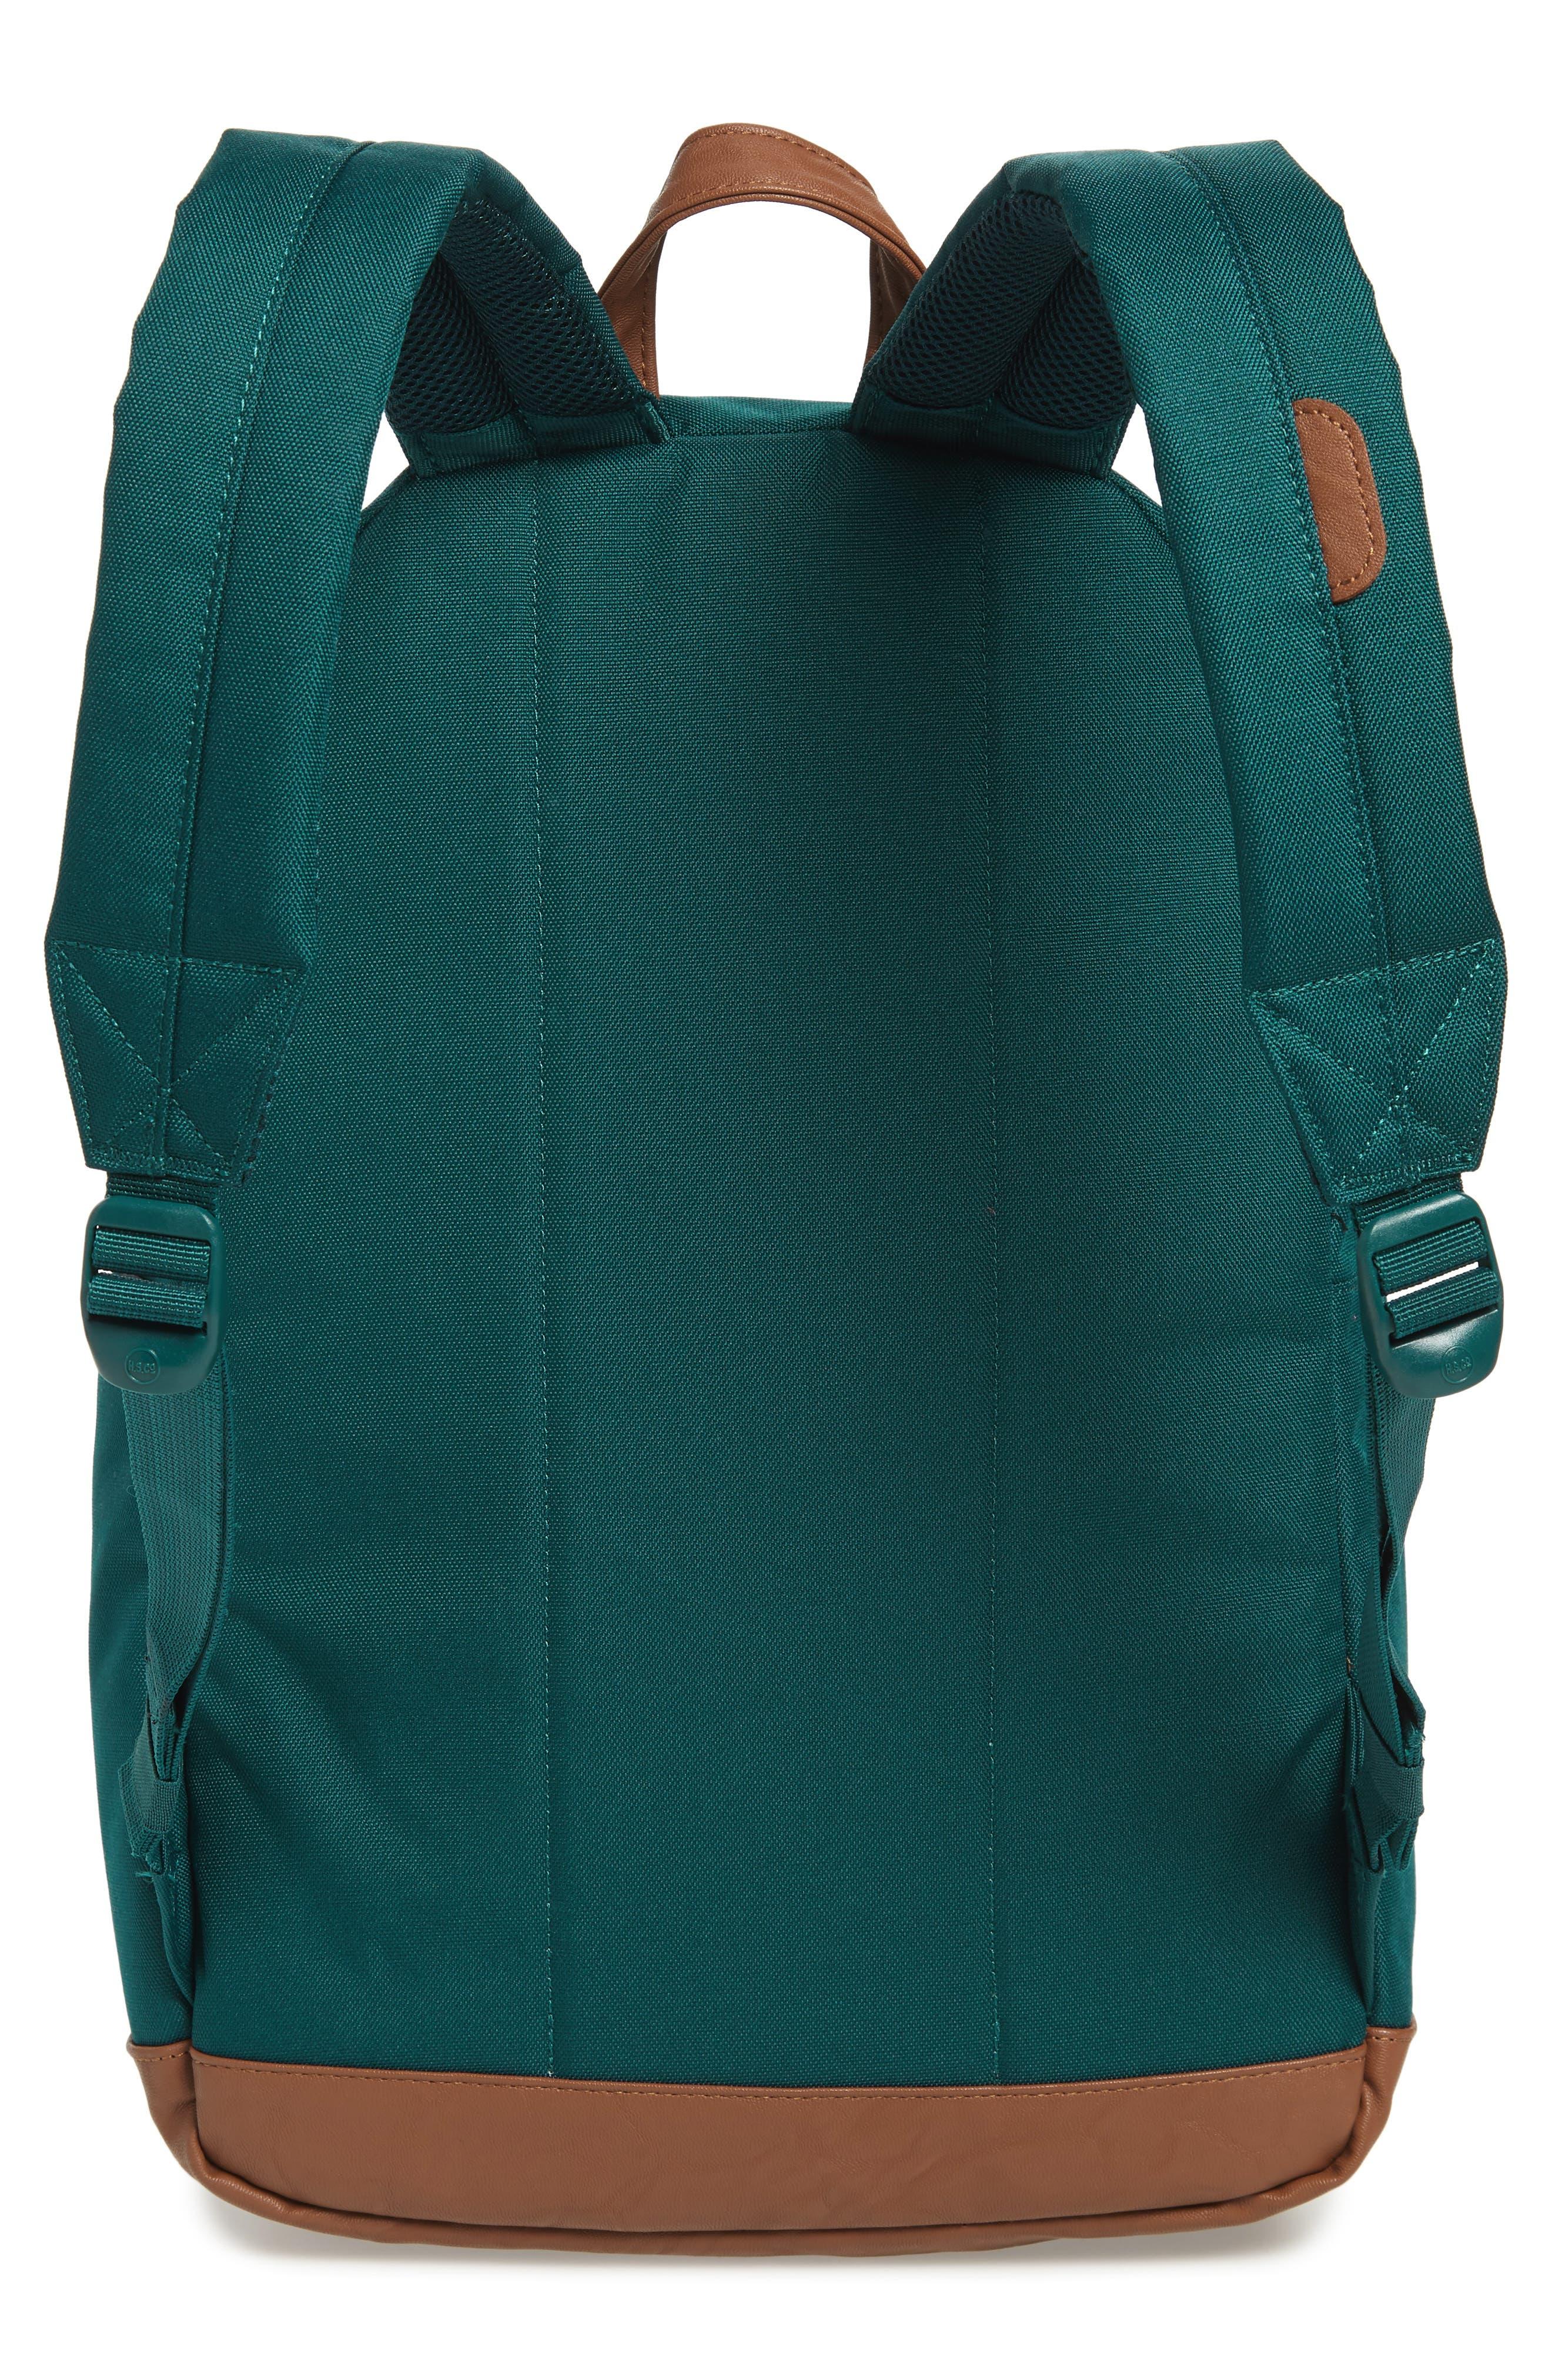 Pop Quiz Backpack,                             Alternate thumbnail 3, color,                             DEEP TEAL/ TAN